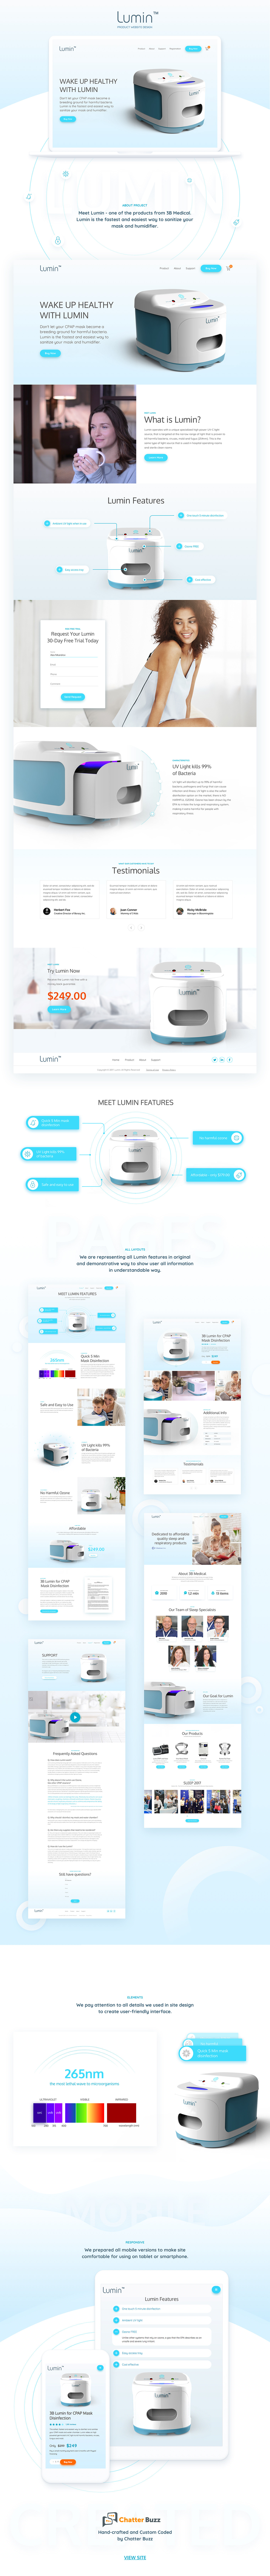 UI ux e-commerce Website Design website development web ui/ux  chatter buzz orlando web design Orlando website design